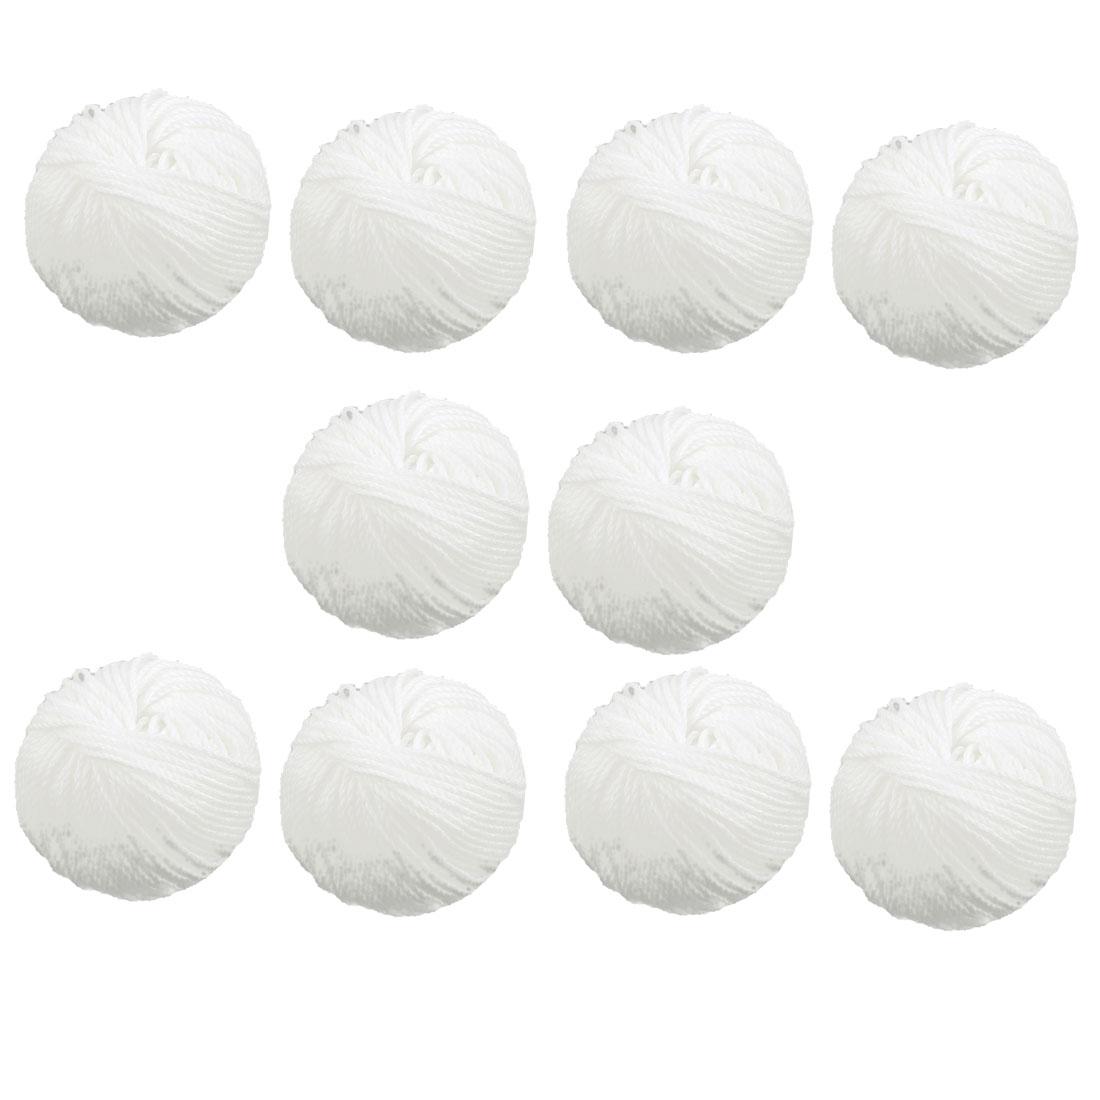 Crochet Knitting Sewing Cotton Thread Balls White 33Ft Long 10pcs